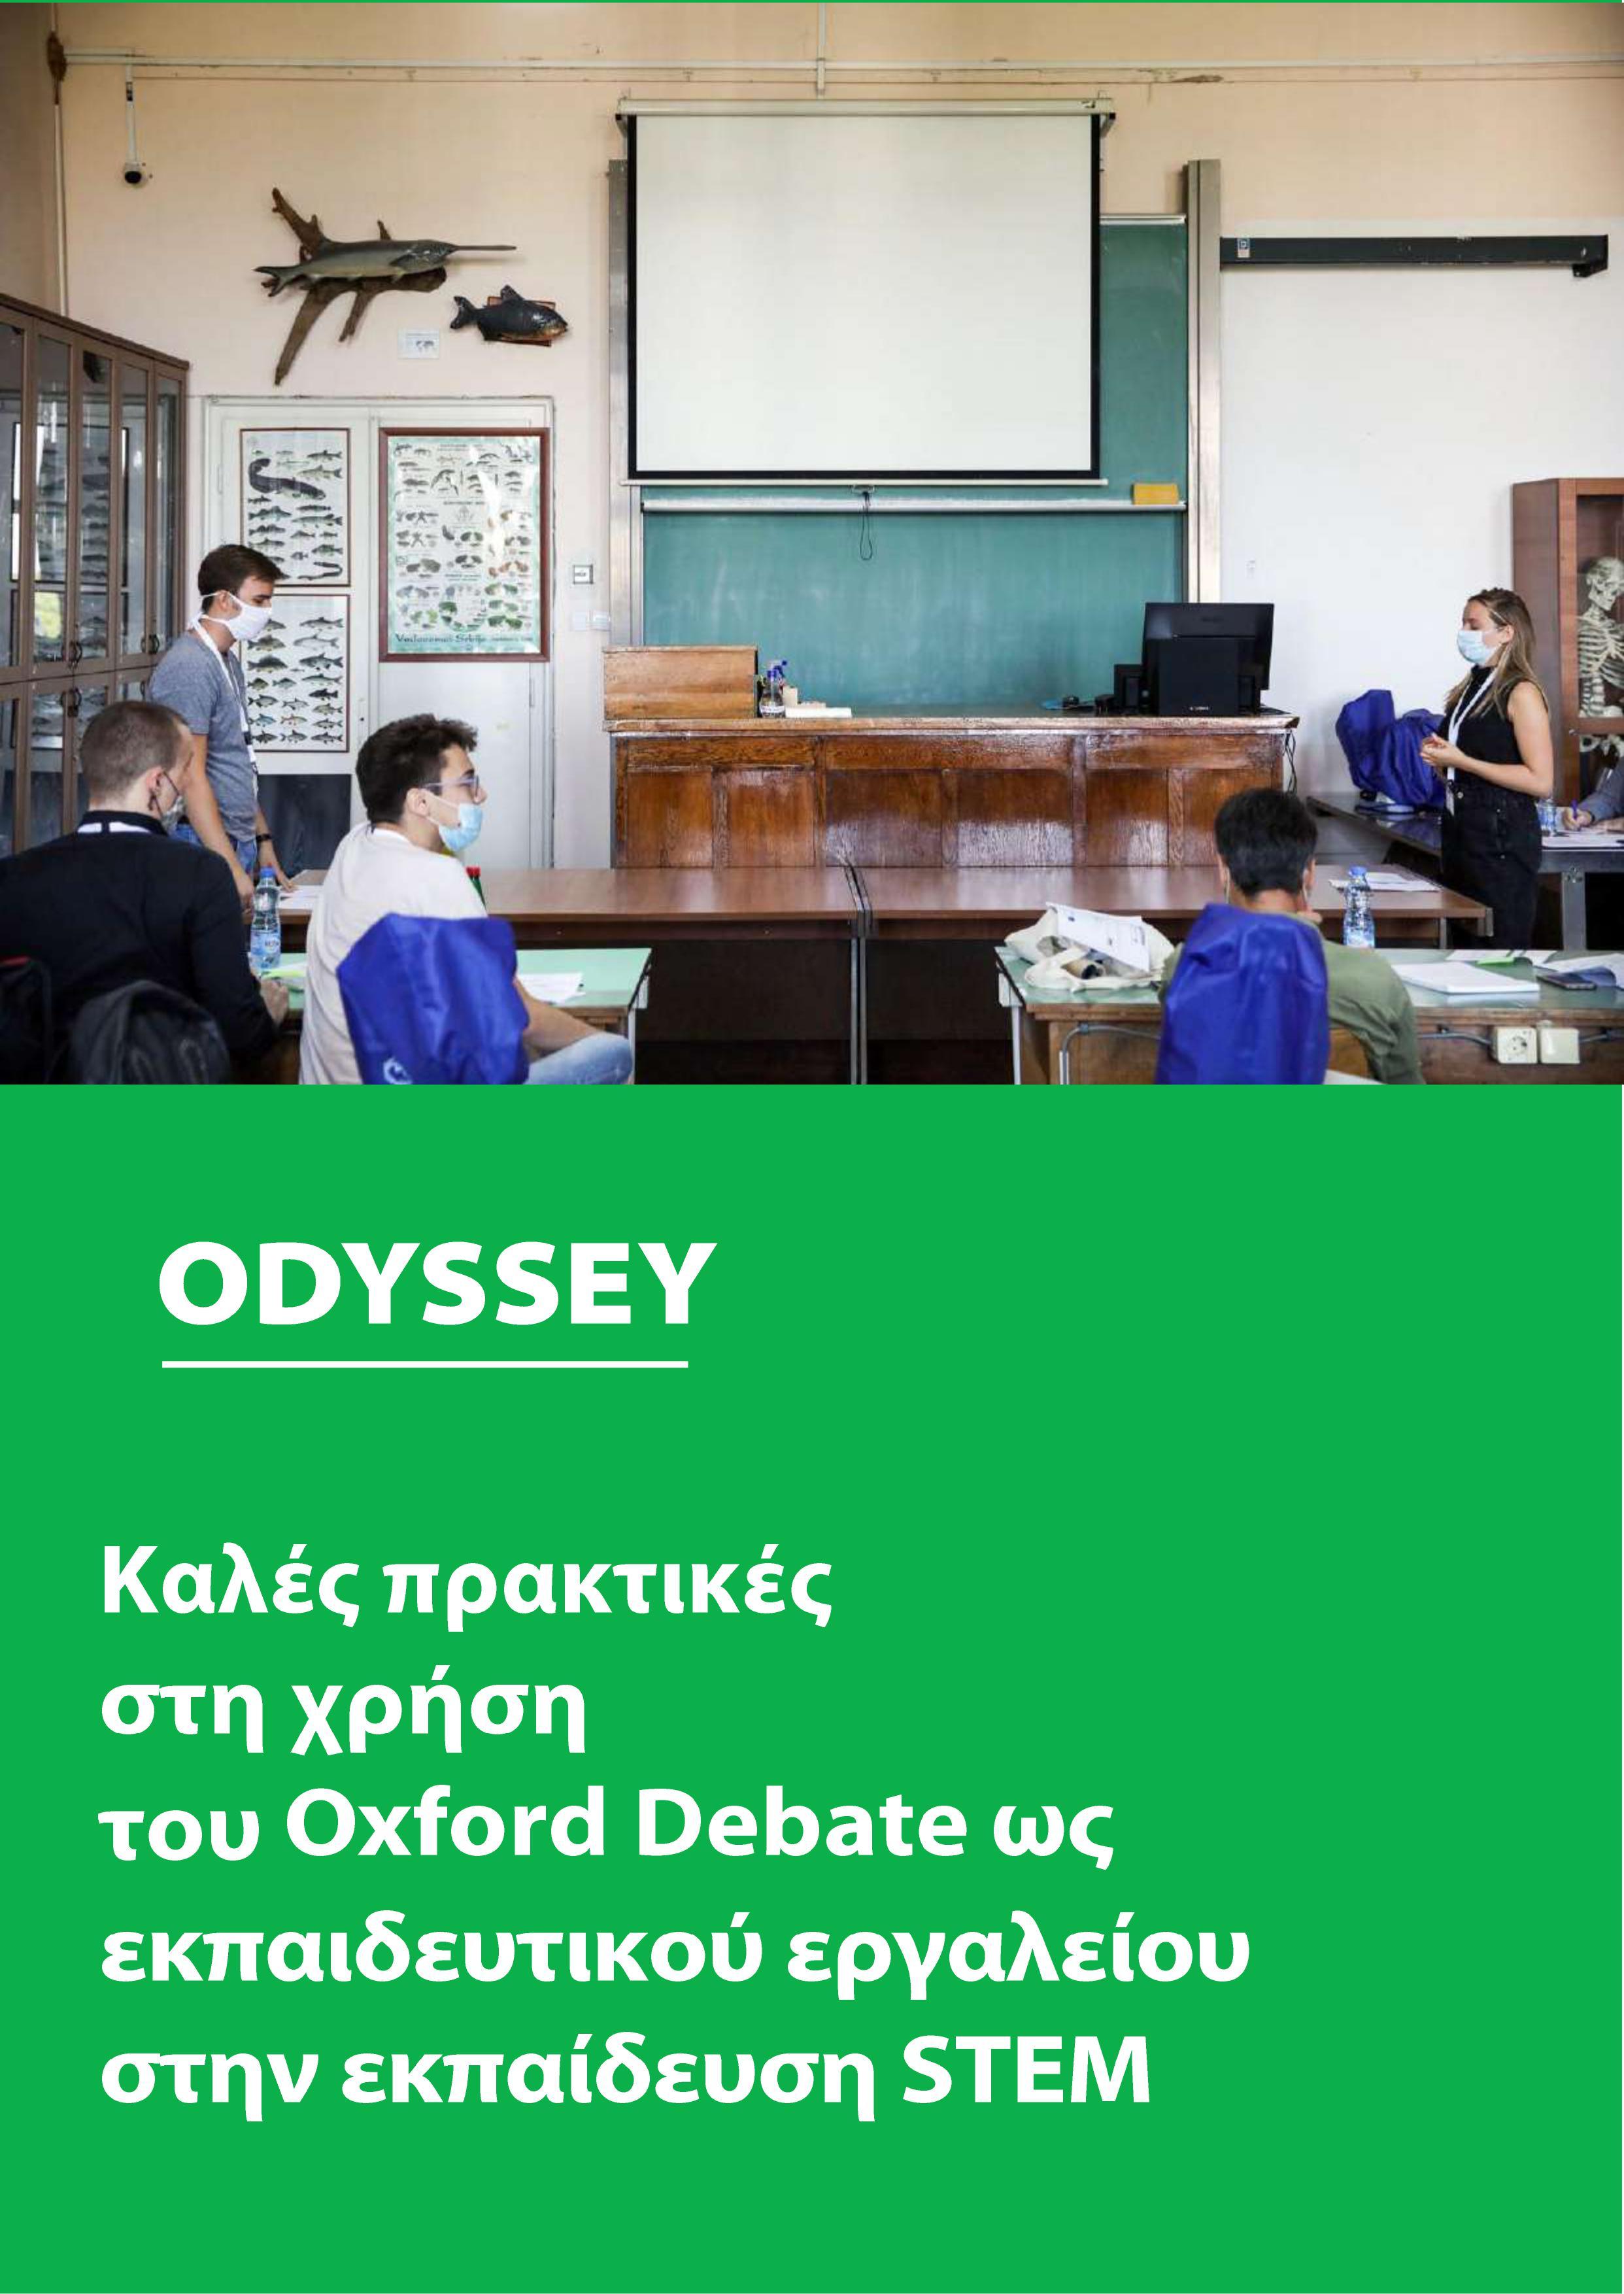 Odyssey. Καλές πρακτικές στη χρήση του Oxford Debate ως εκπαιδευτικού εργαλείου στη διδακτική STEM